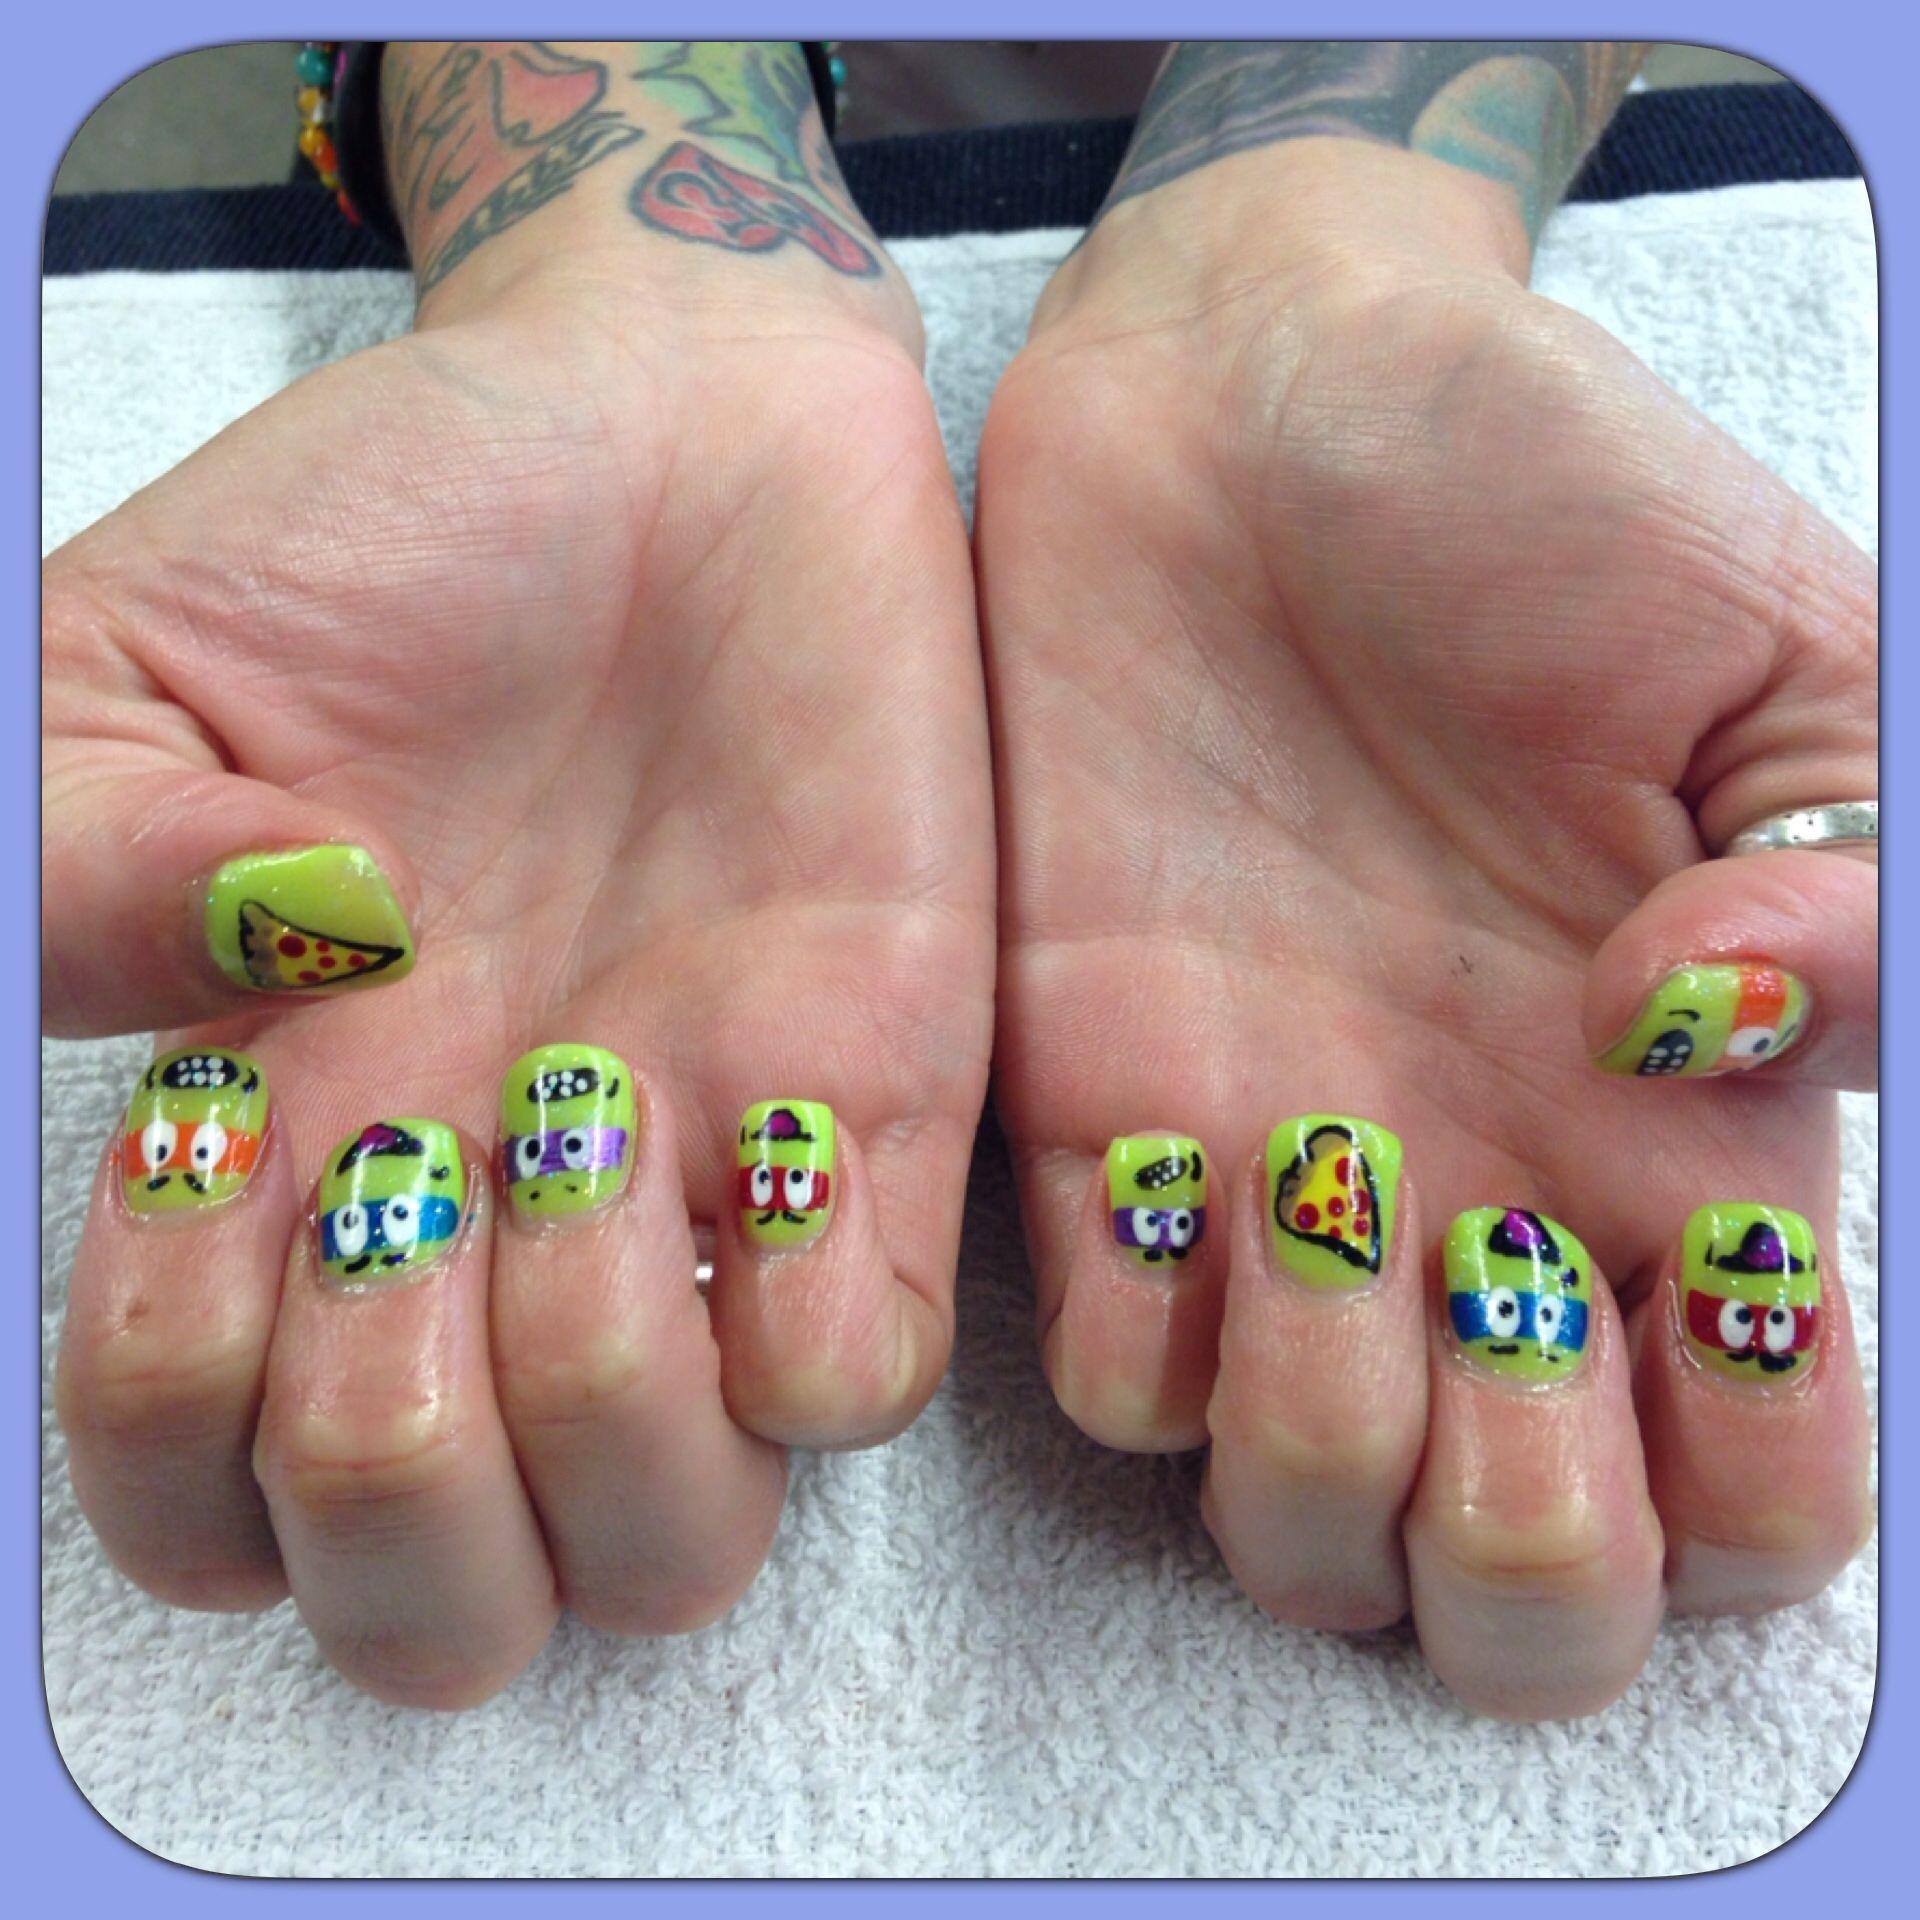 Nail Design Ninja Turtle Gel Glitter nails   My Nail Designs ...